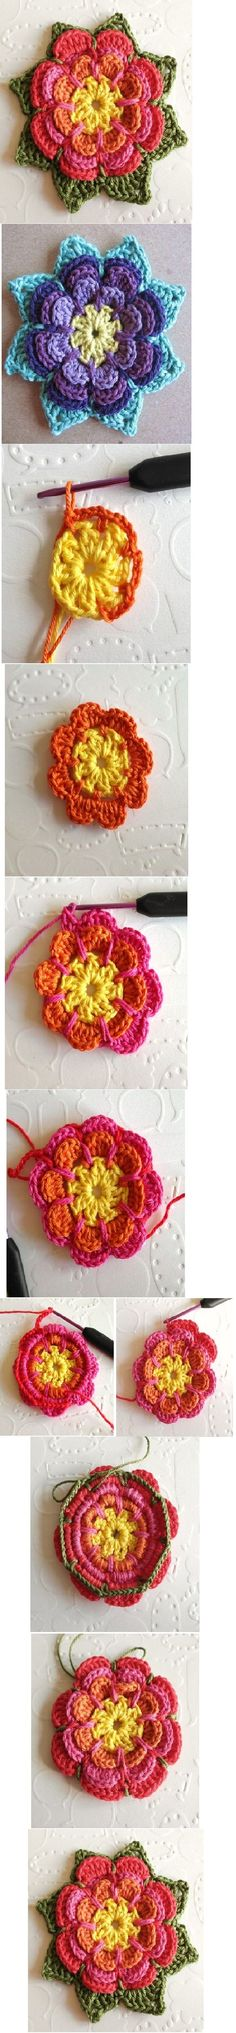 flower crochet motif - quick tutorial! by KathrynBArnold